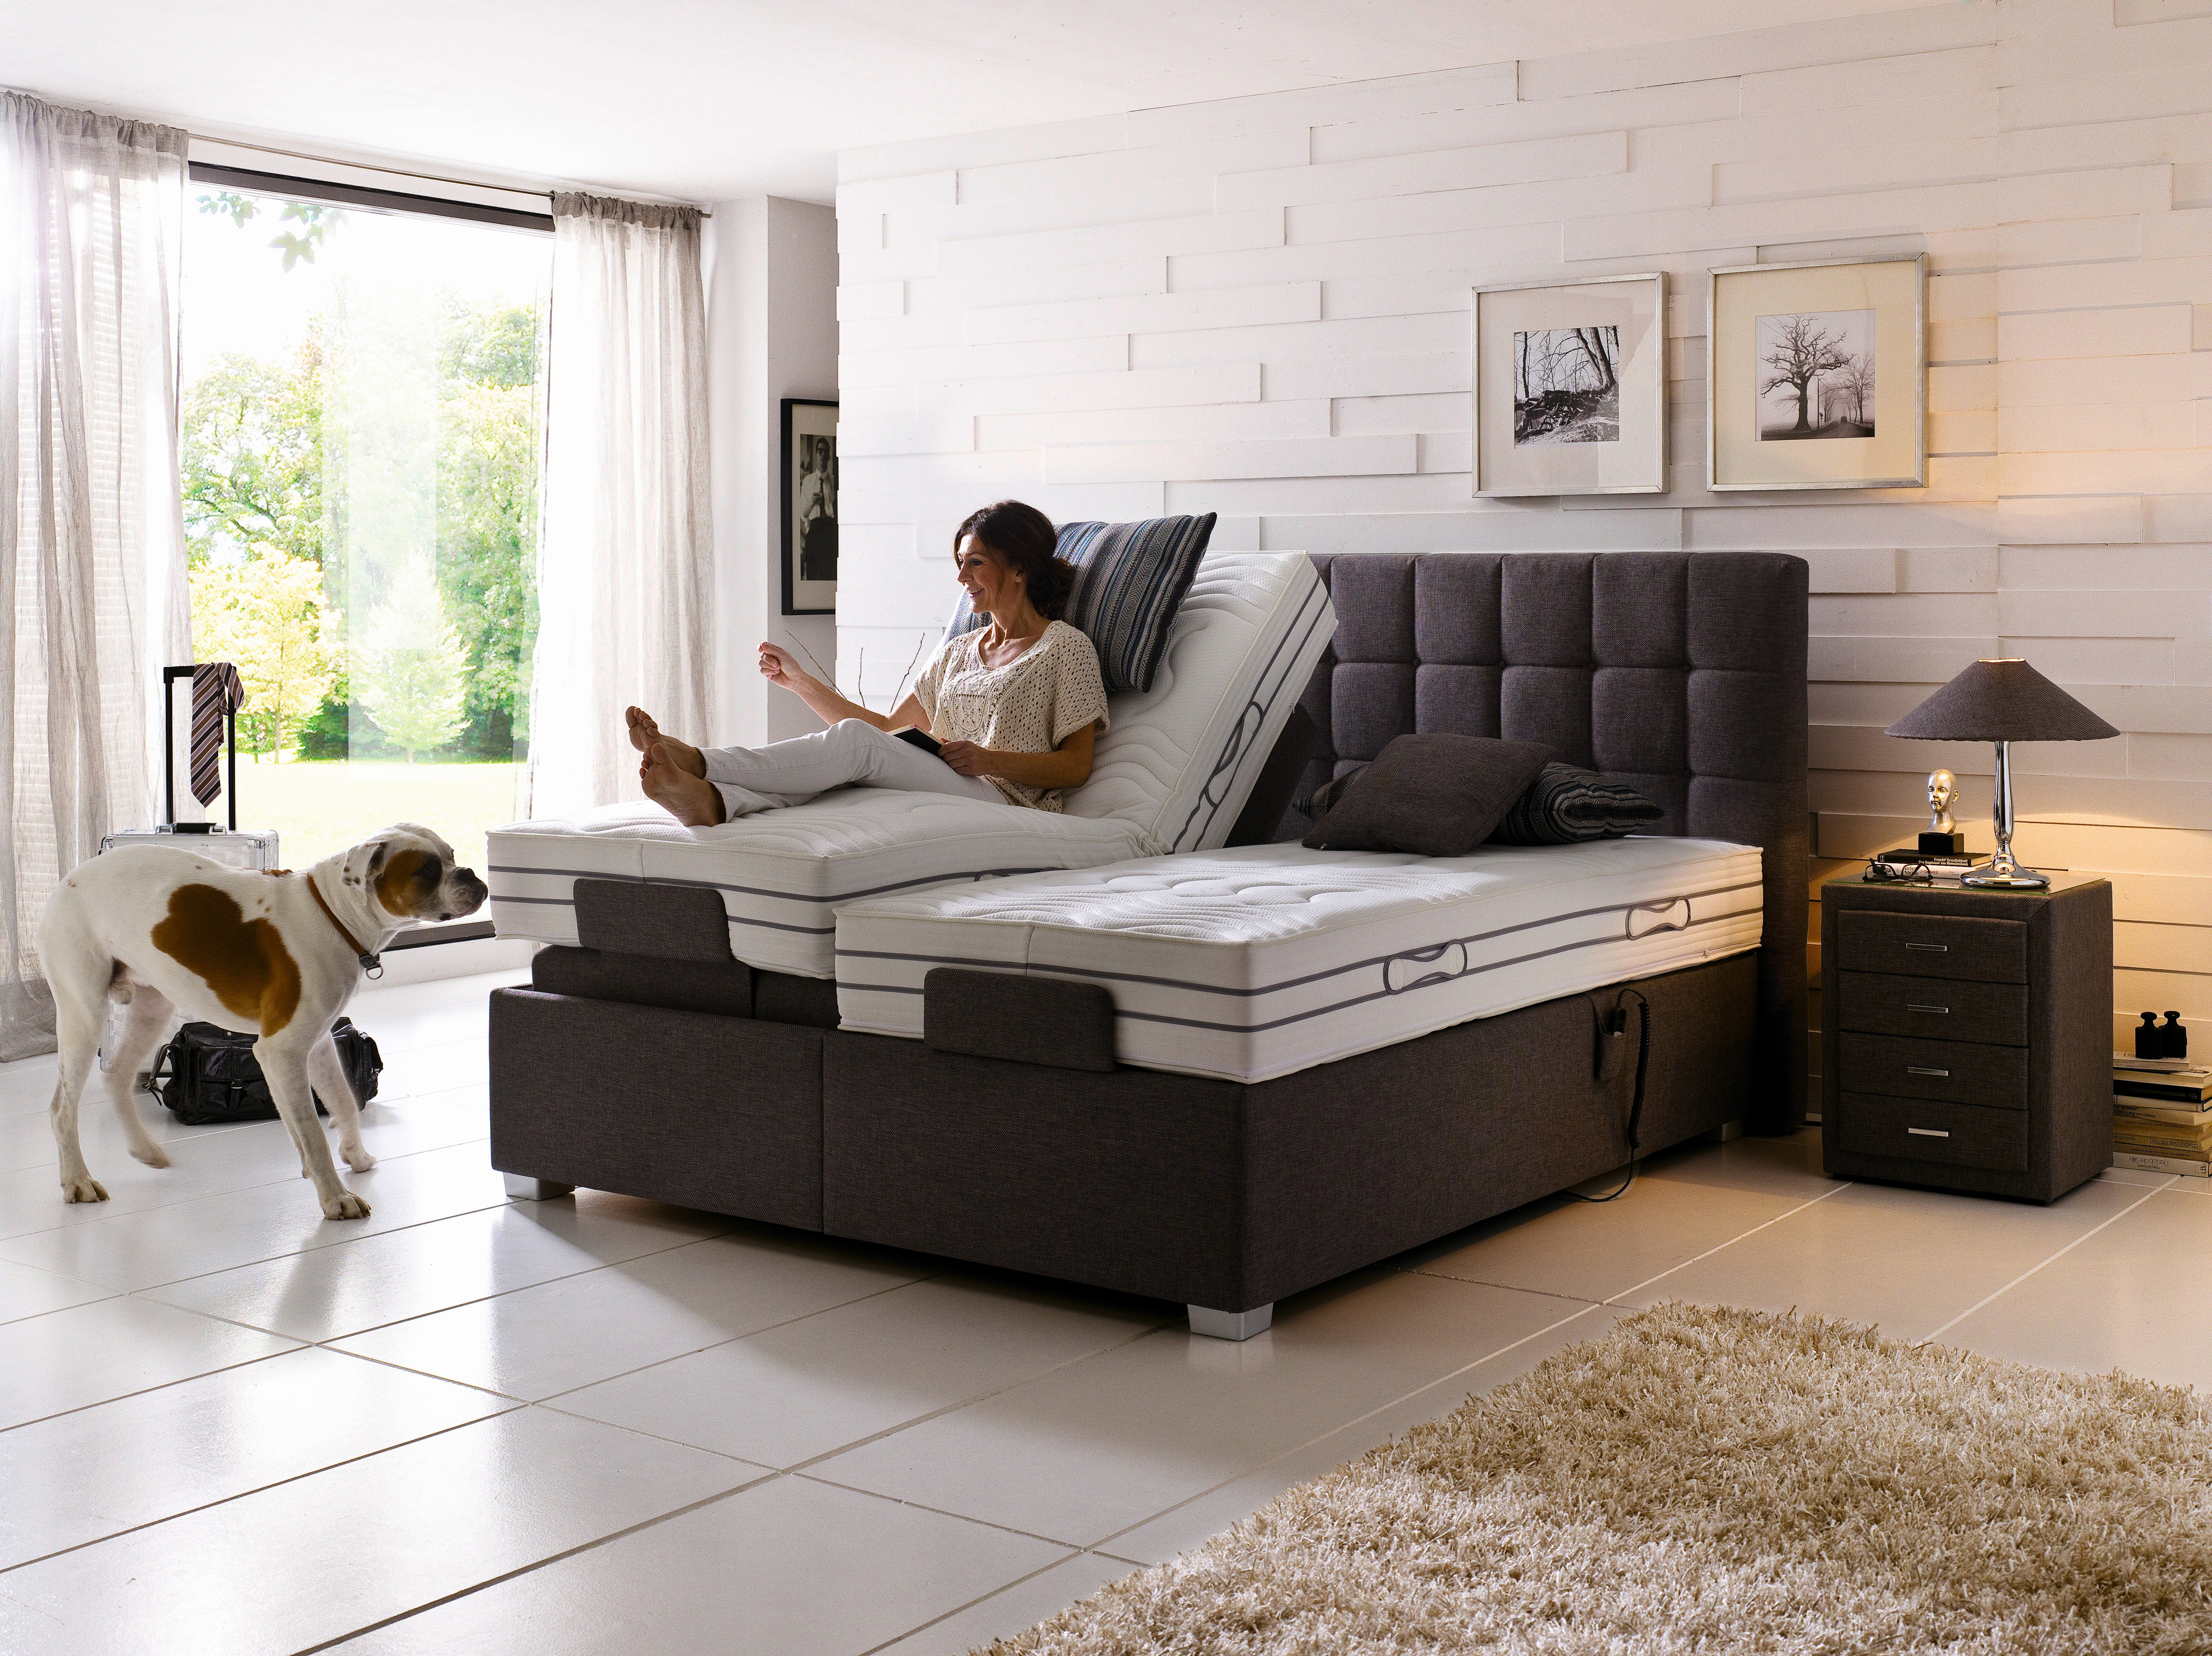 oschmann boxspringbett belcanto paris mit motor in braun m bel letz. Black Bedroom Furniture Sets. Home Design Ideas